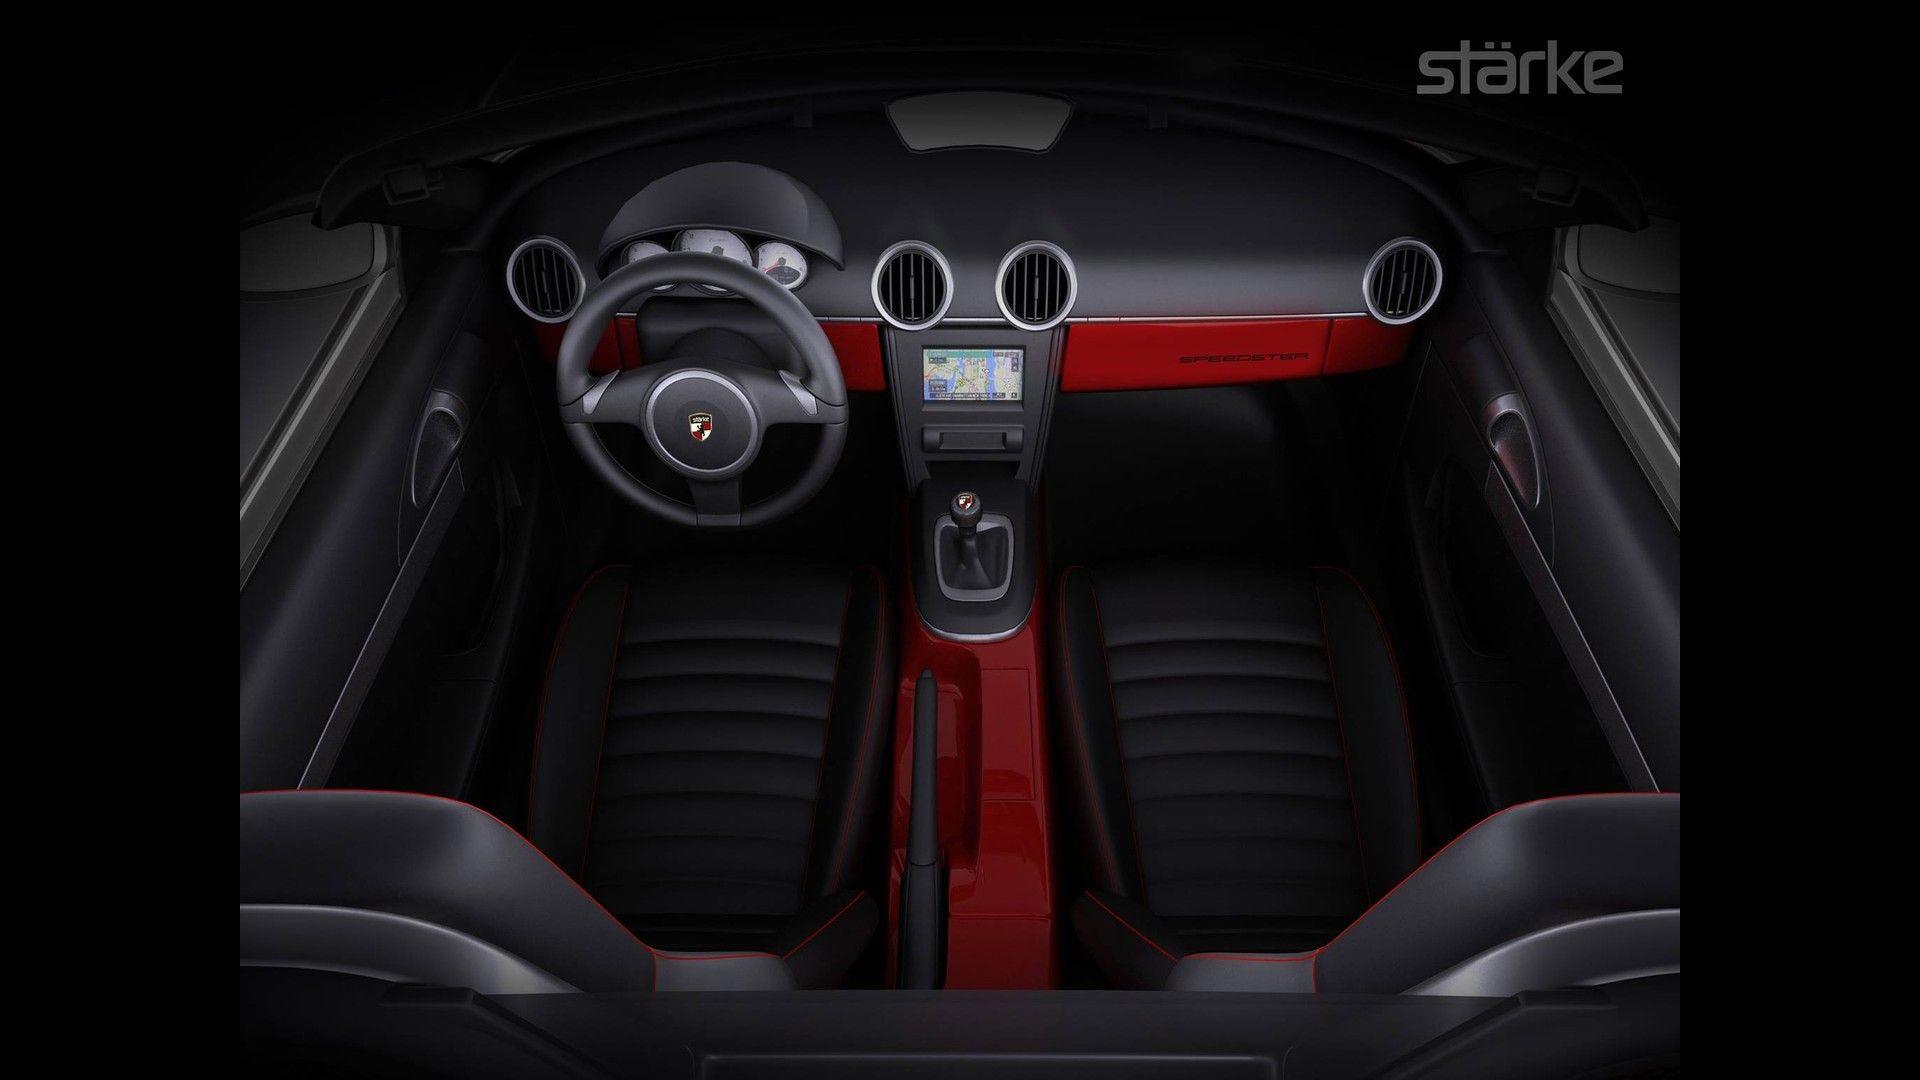 starke-revolution-speedster-sc (3)